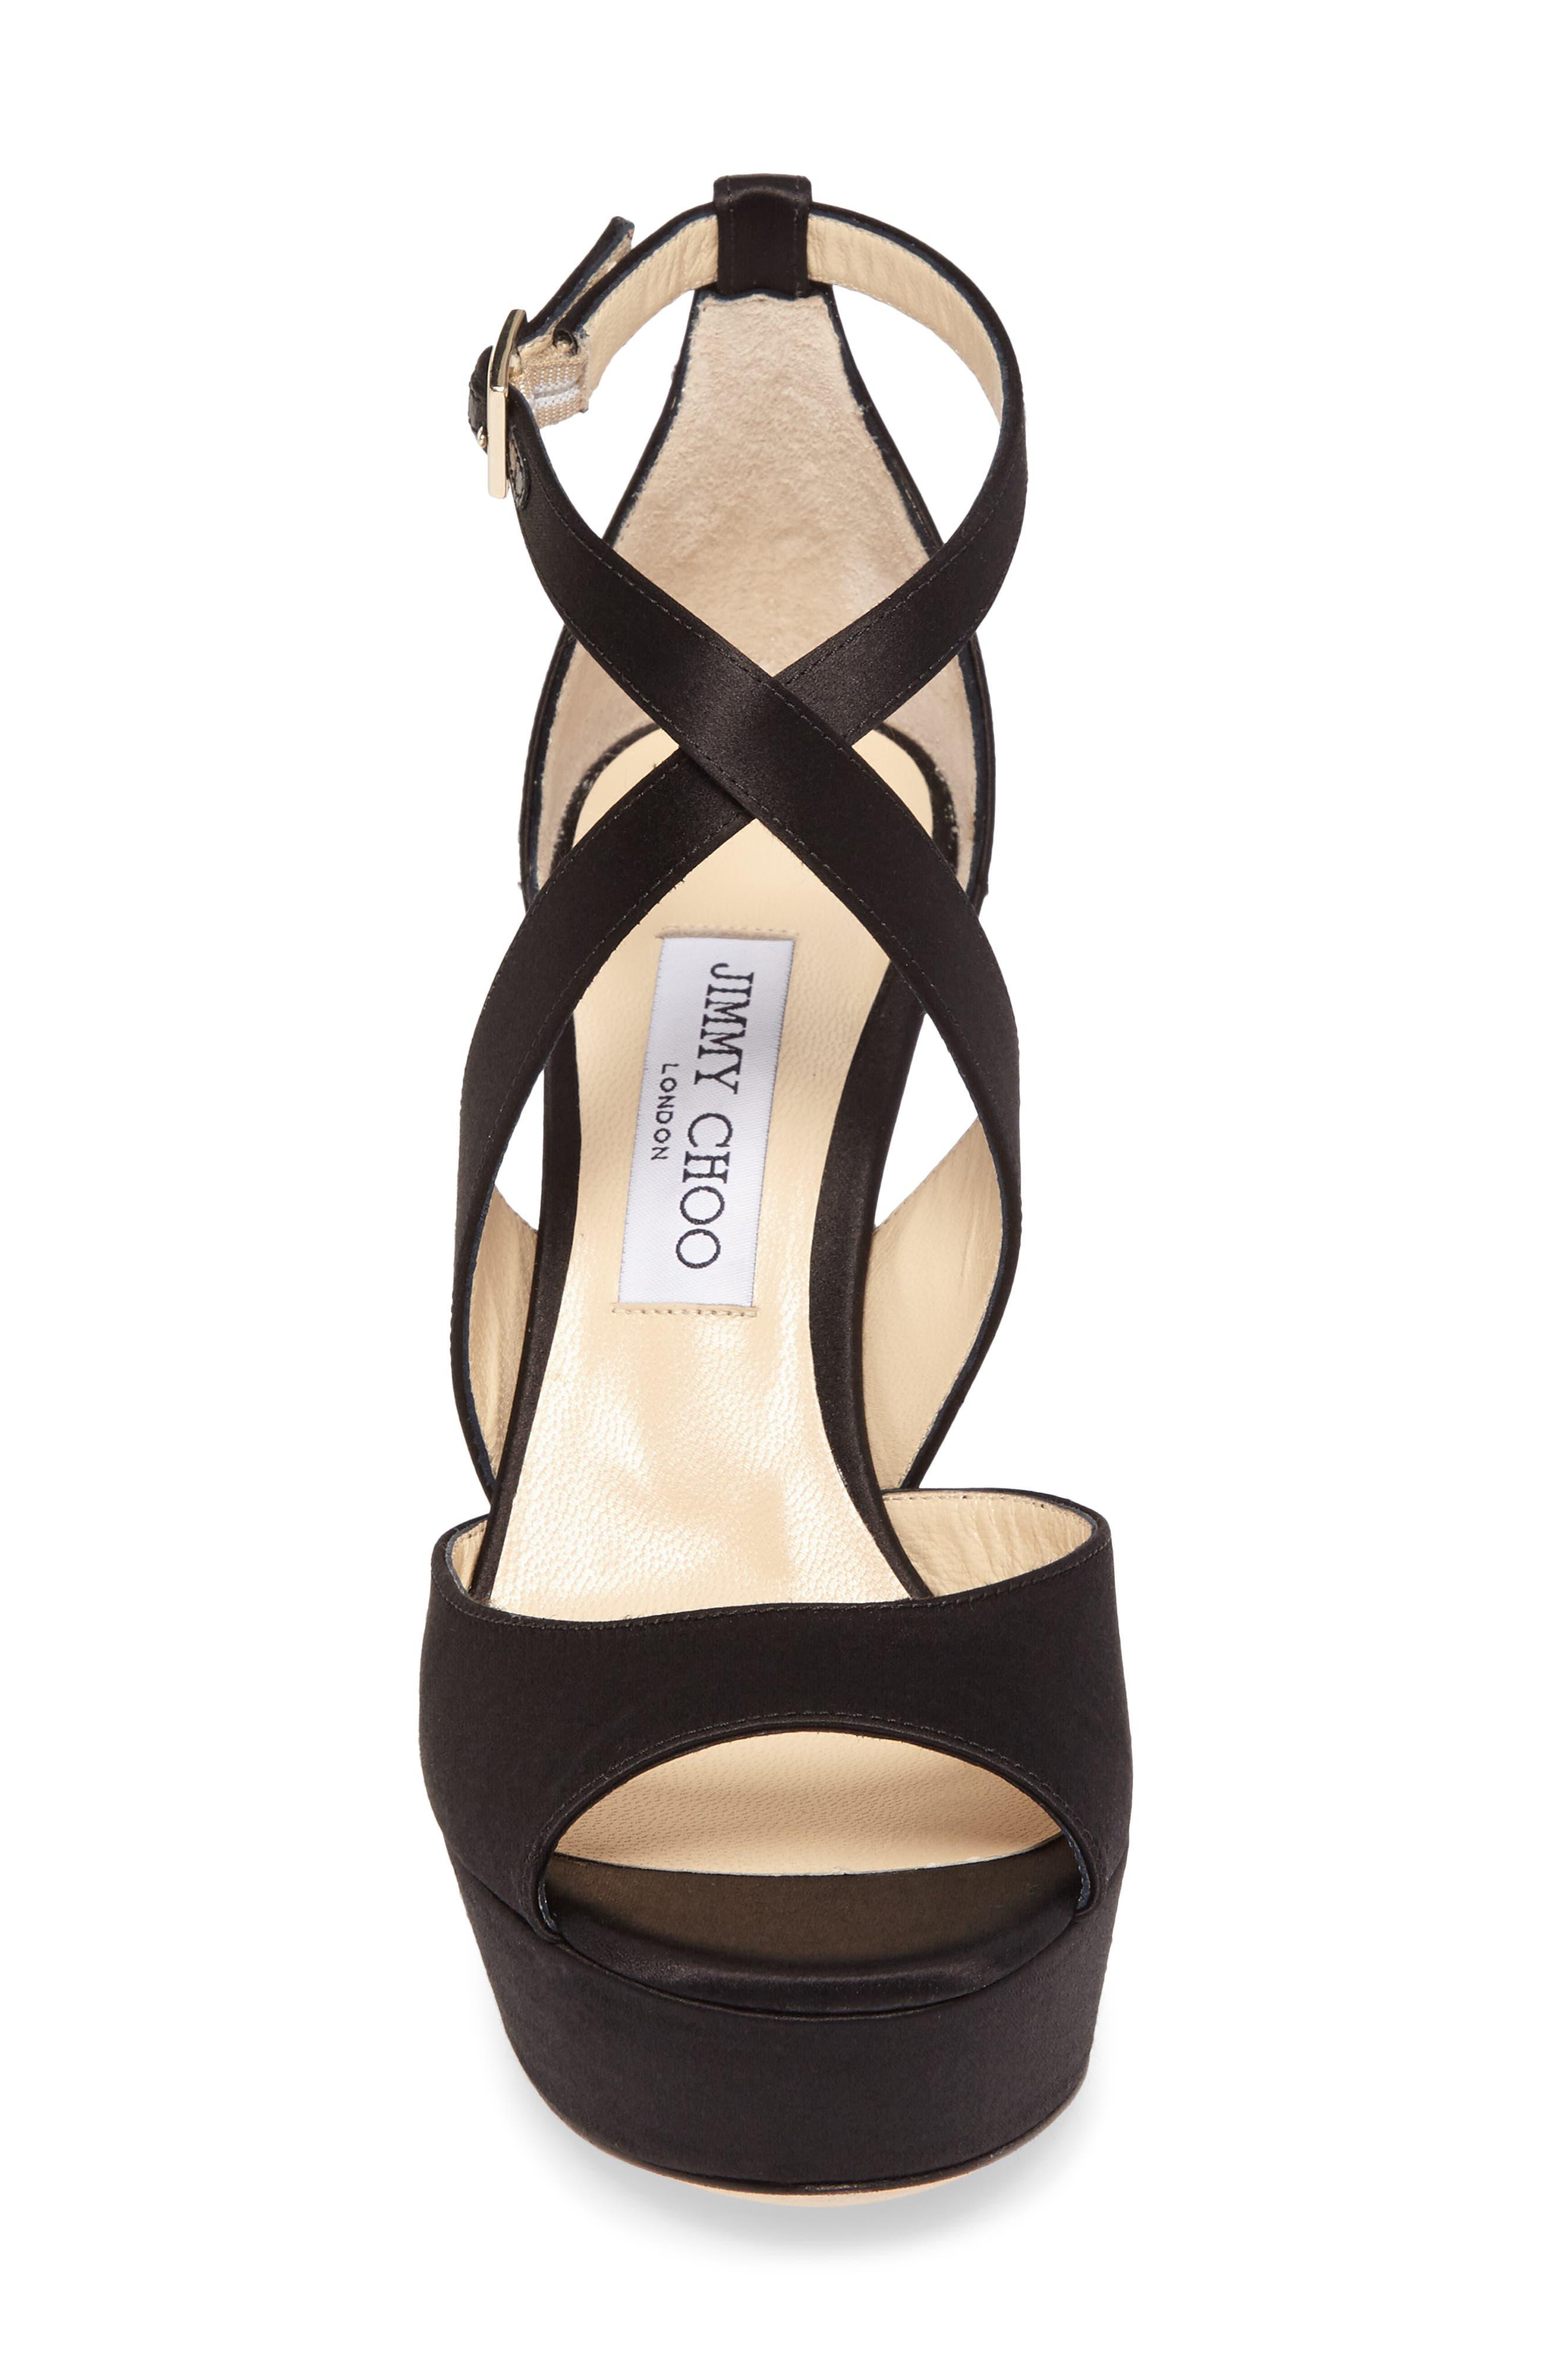 April Platform Sandal,                             Alternate thumbnail 4, color,                             Black/ Anthracite/ Black